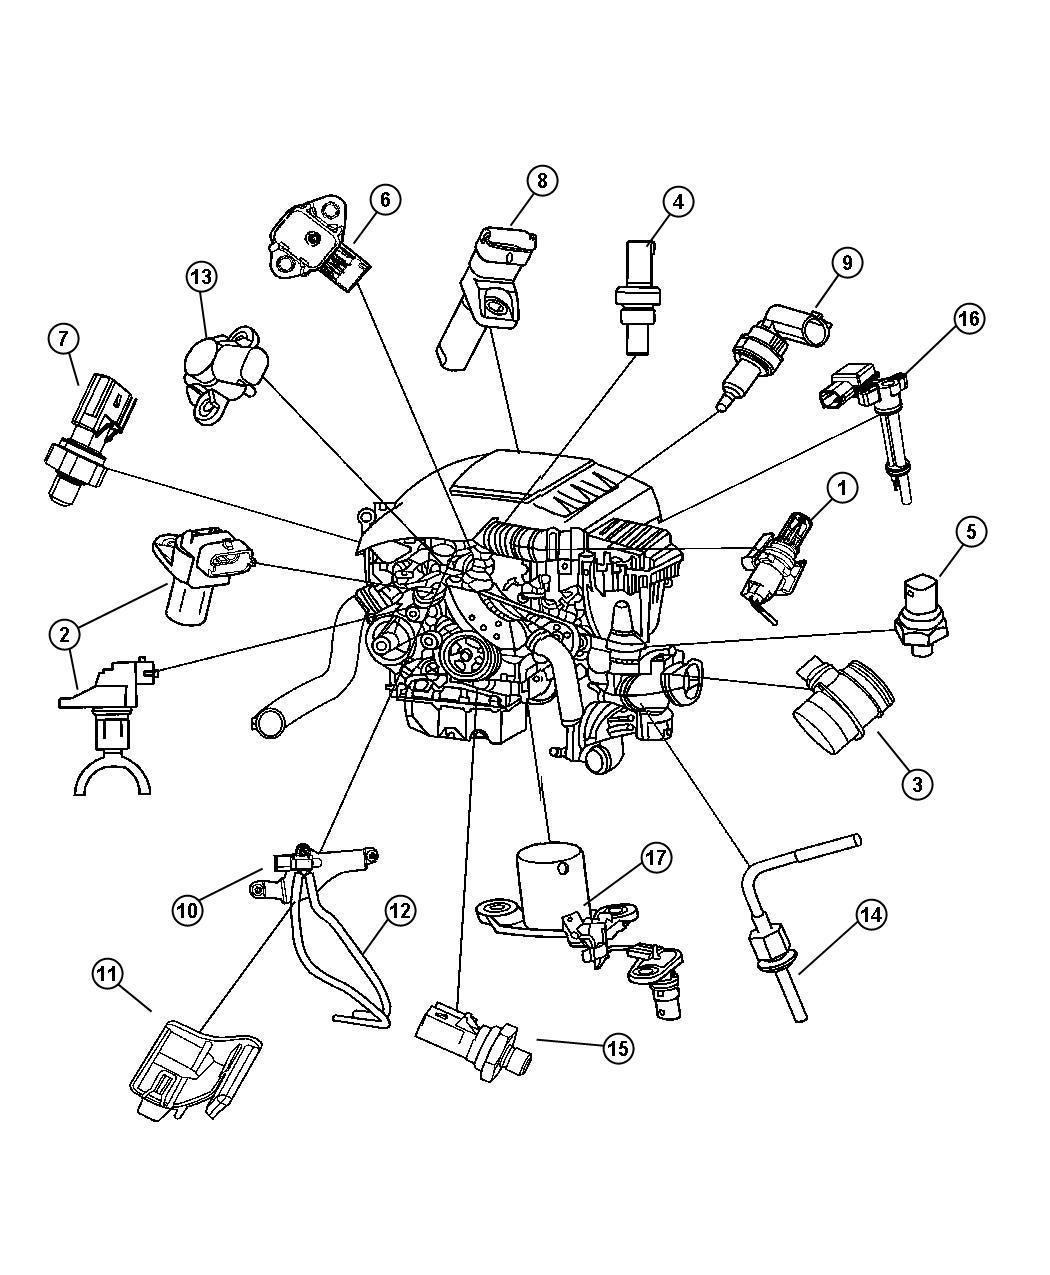 Awesome 1998 Bmw 740I Fuse Diagram Auto Electrical Wiring Diagram Wiring Cloud Rometaidewilluminateatxorg